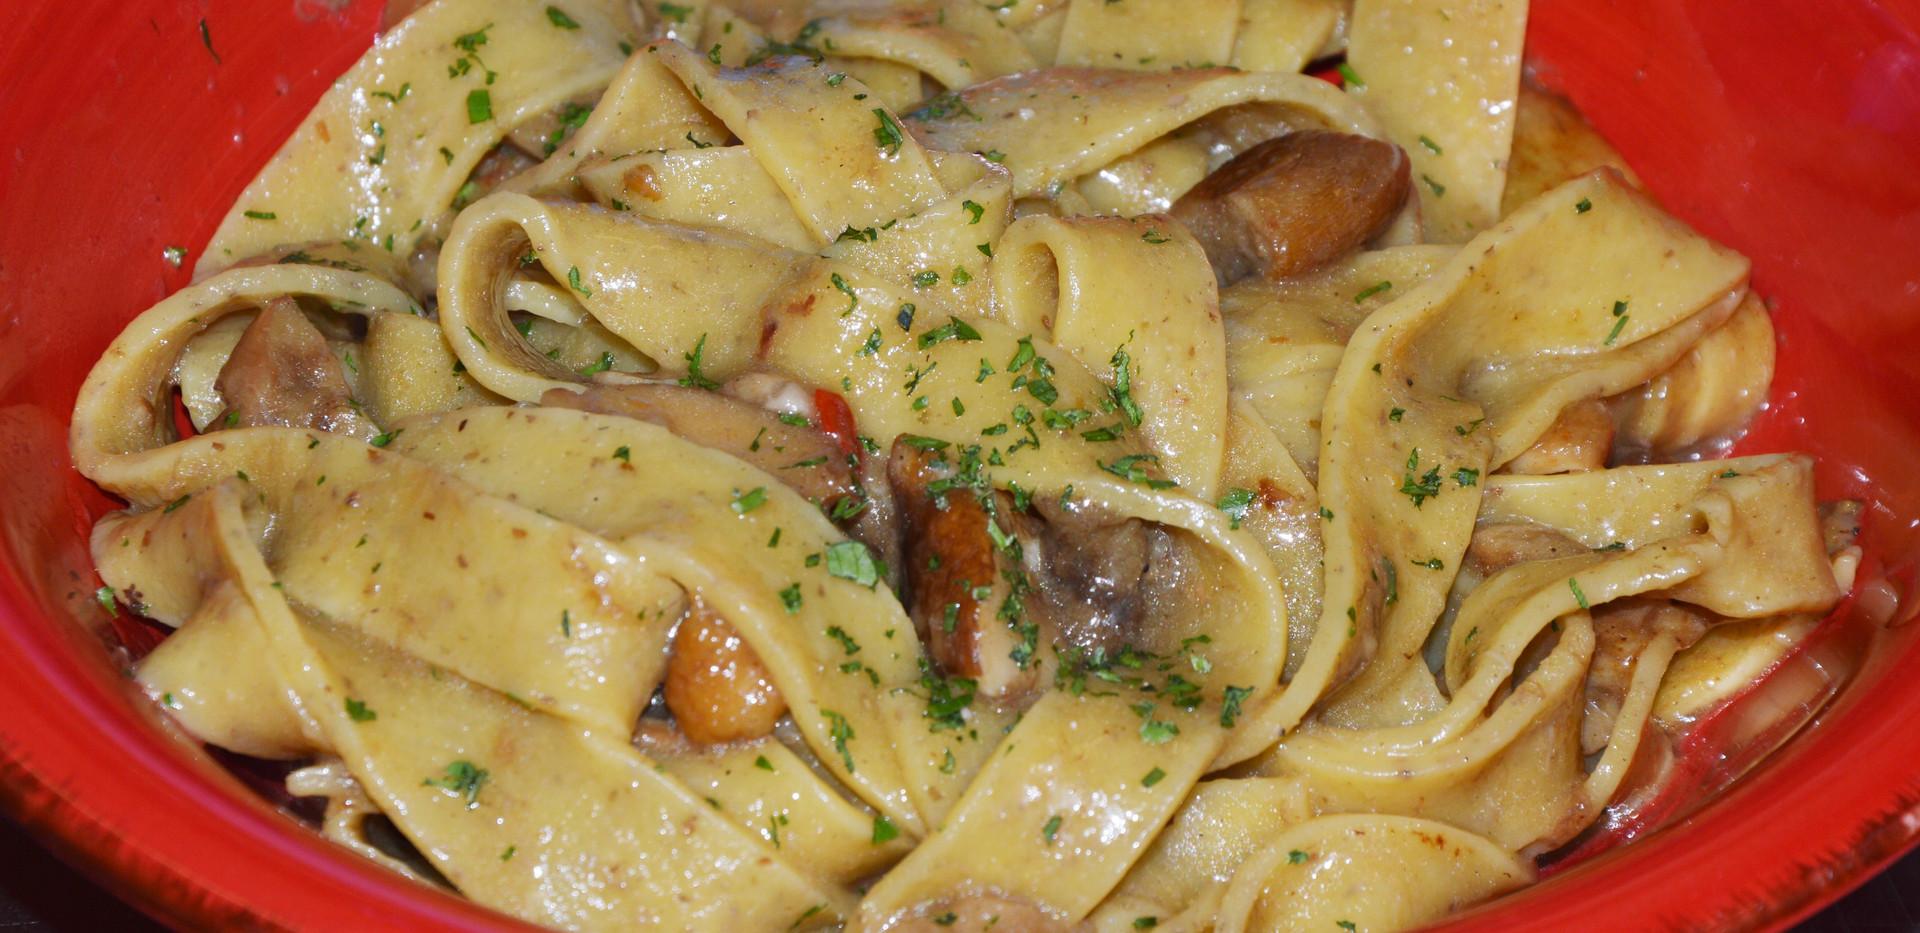 fettuccina casareccia ai funghi porcini #osteriadarbruttone